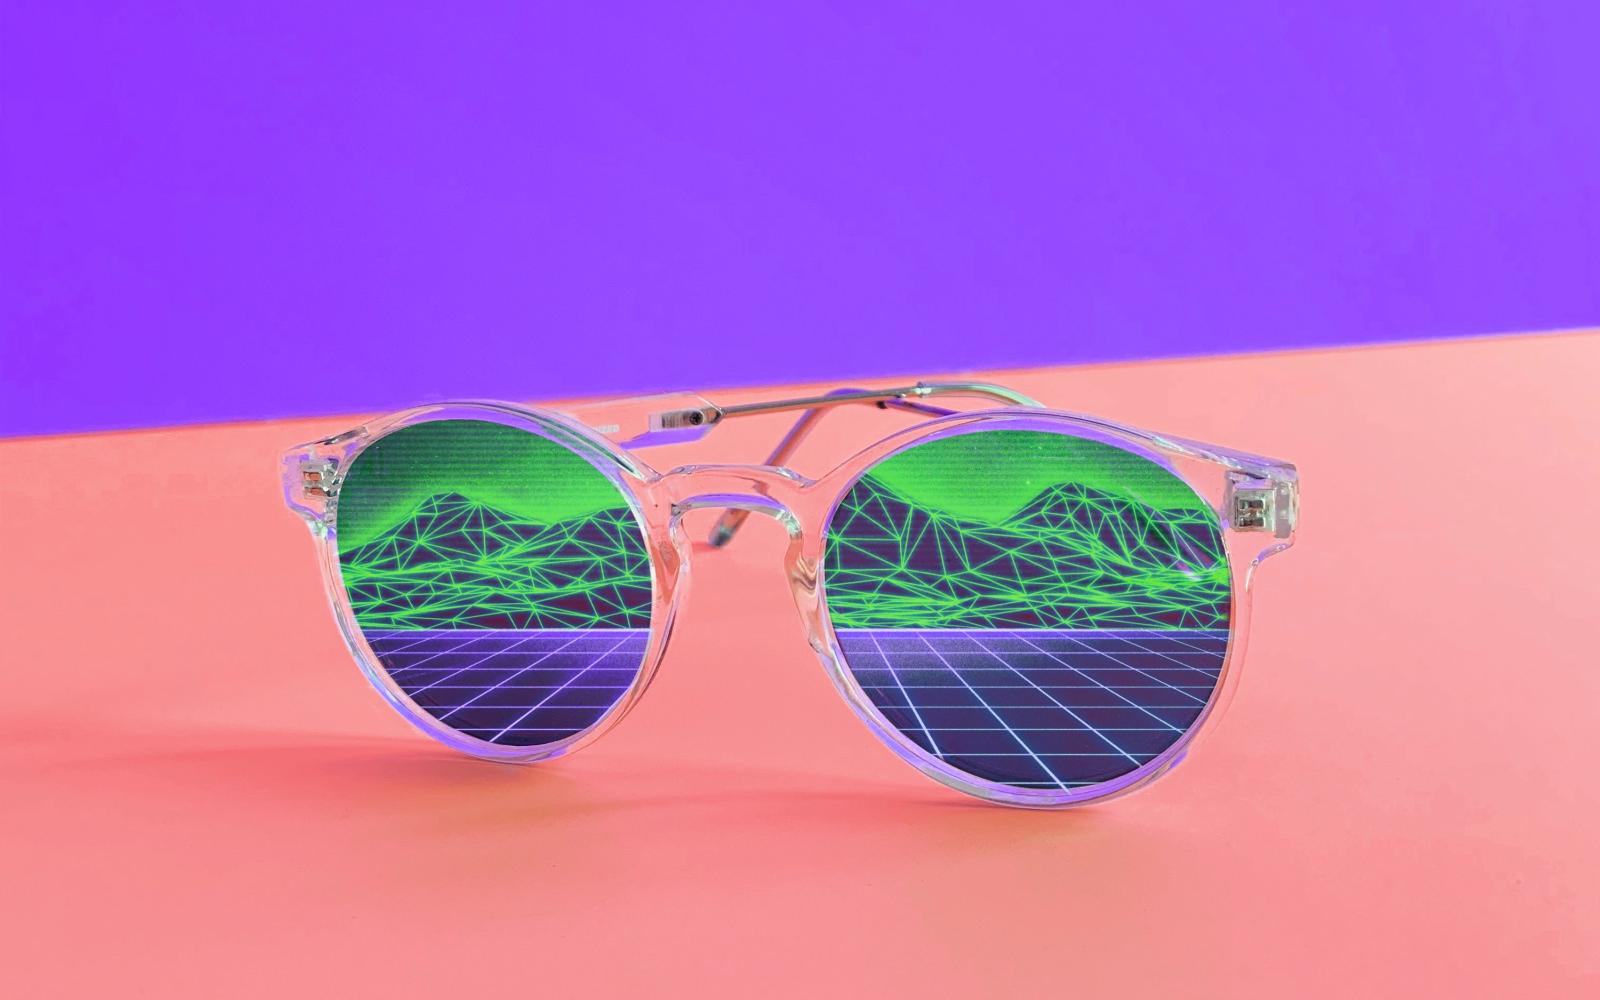 joshua-coleman-kFRKvJQtNHg-unsplash-Apple-AR-Glasses.jpg